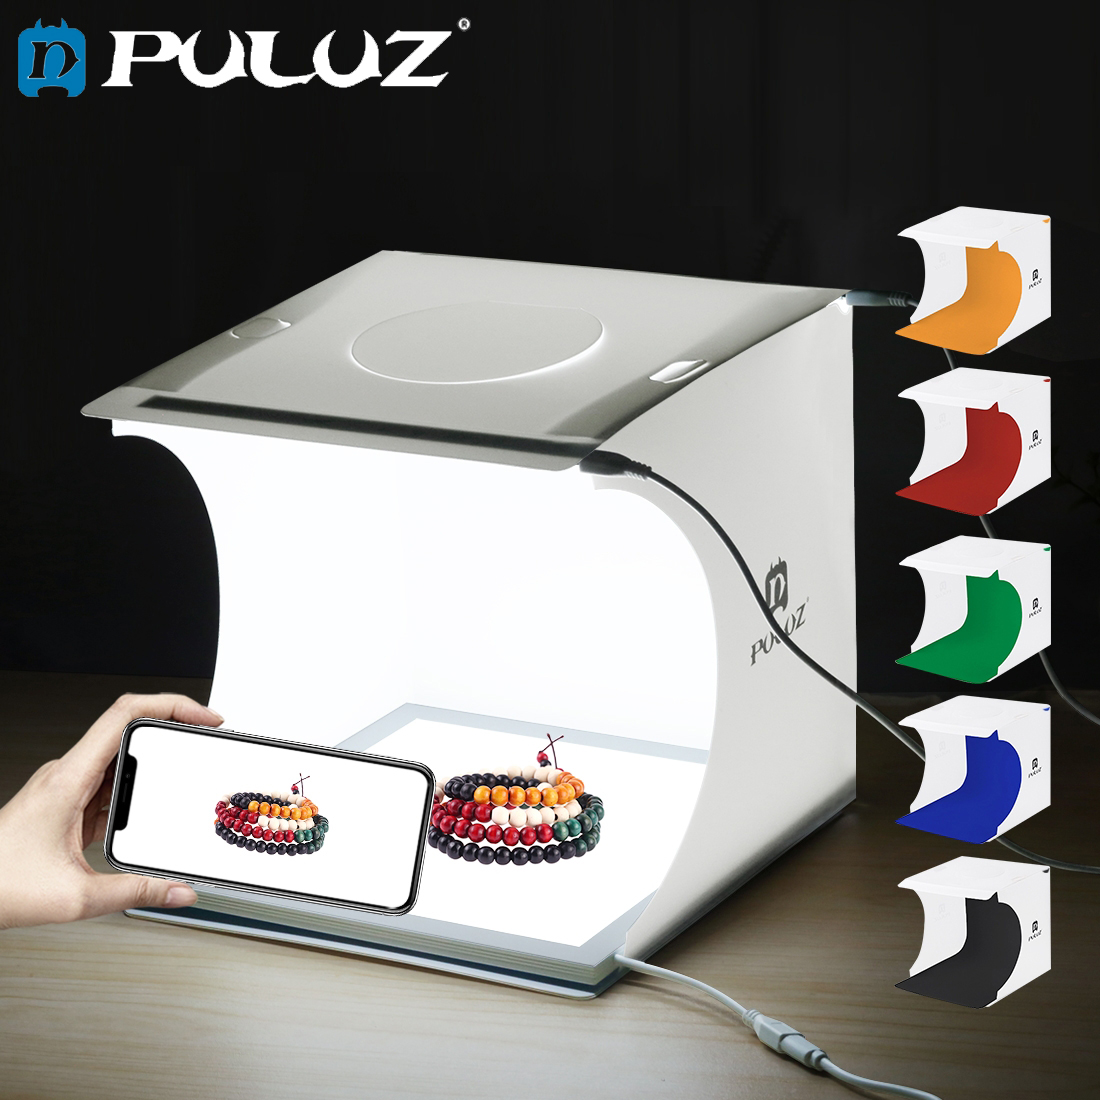 Puluz 20cm mini photo box studio shadowless luz painel da lâmpada almofada + estúdio tiro tenda caixa de luz branca tenda kit